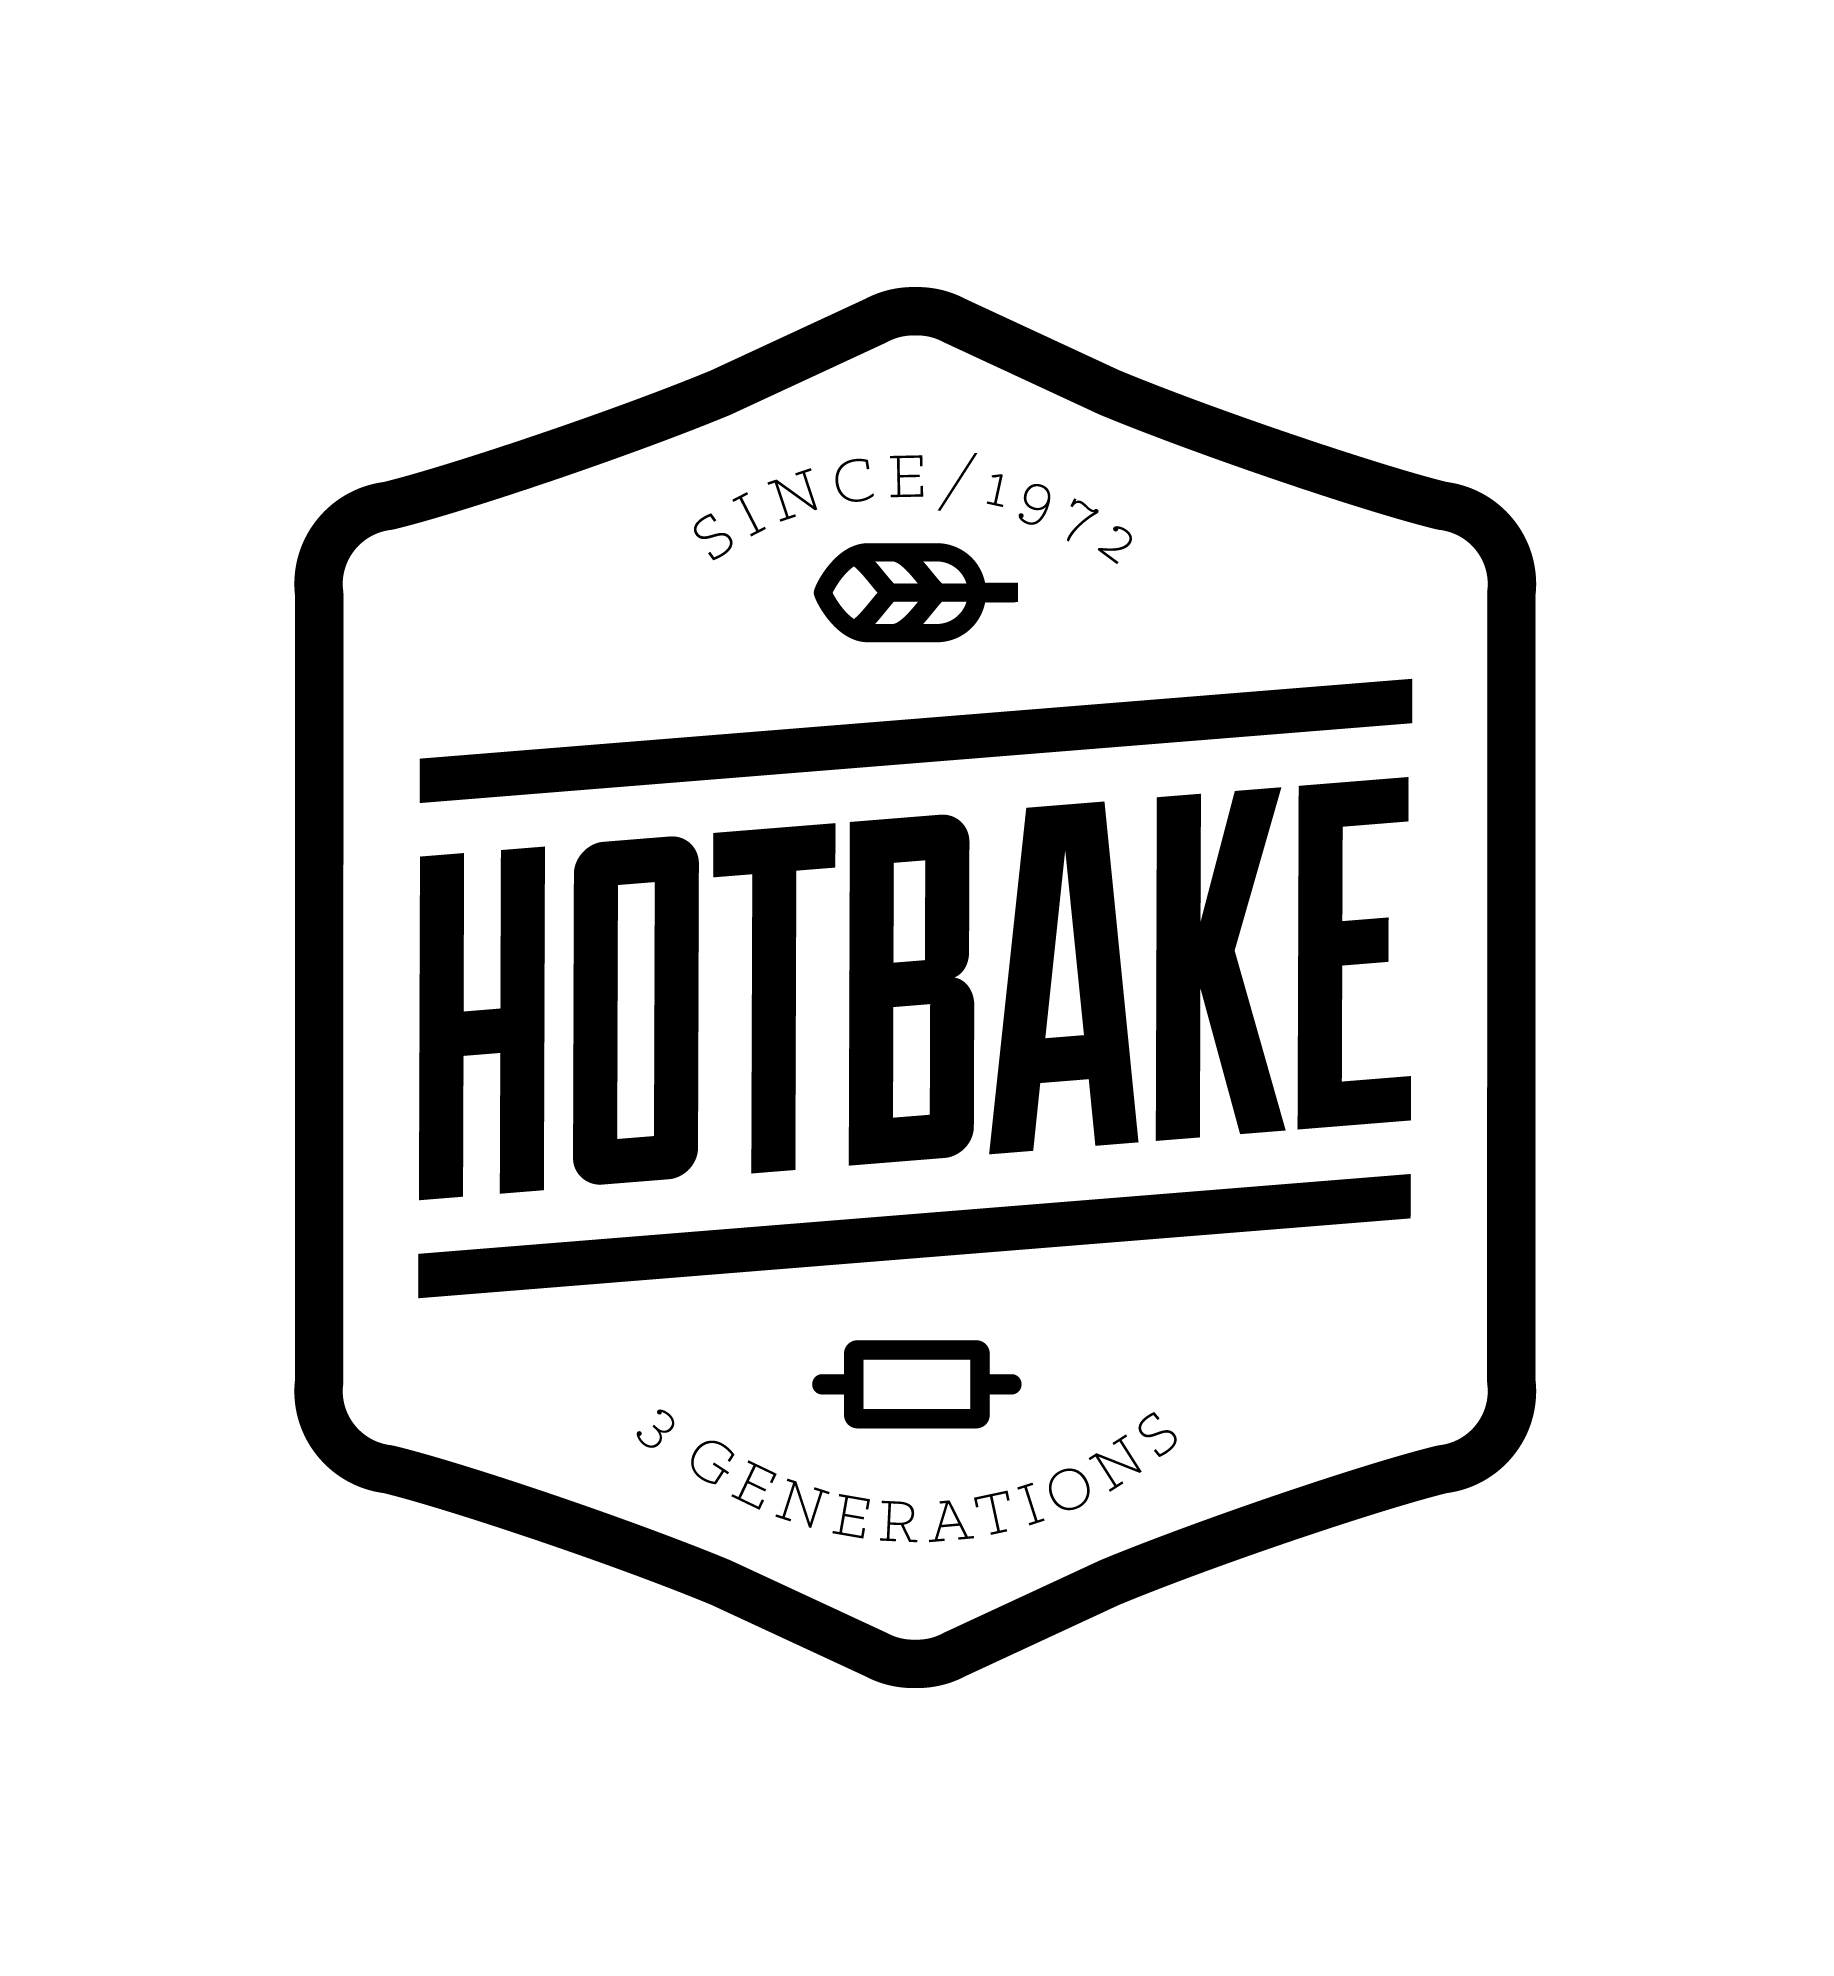 Hotbake Logo